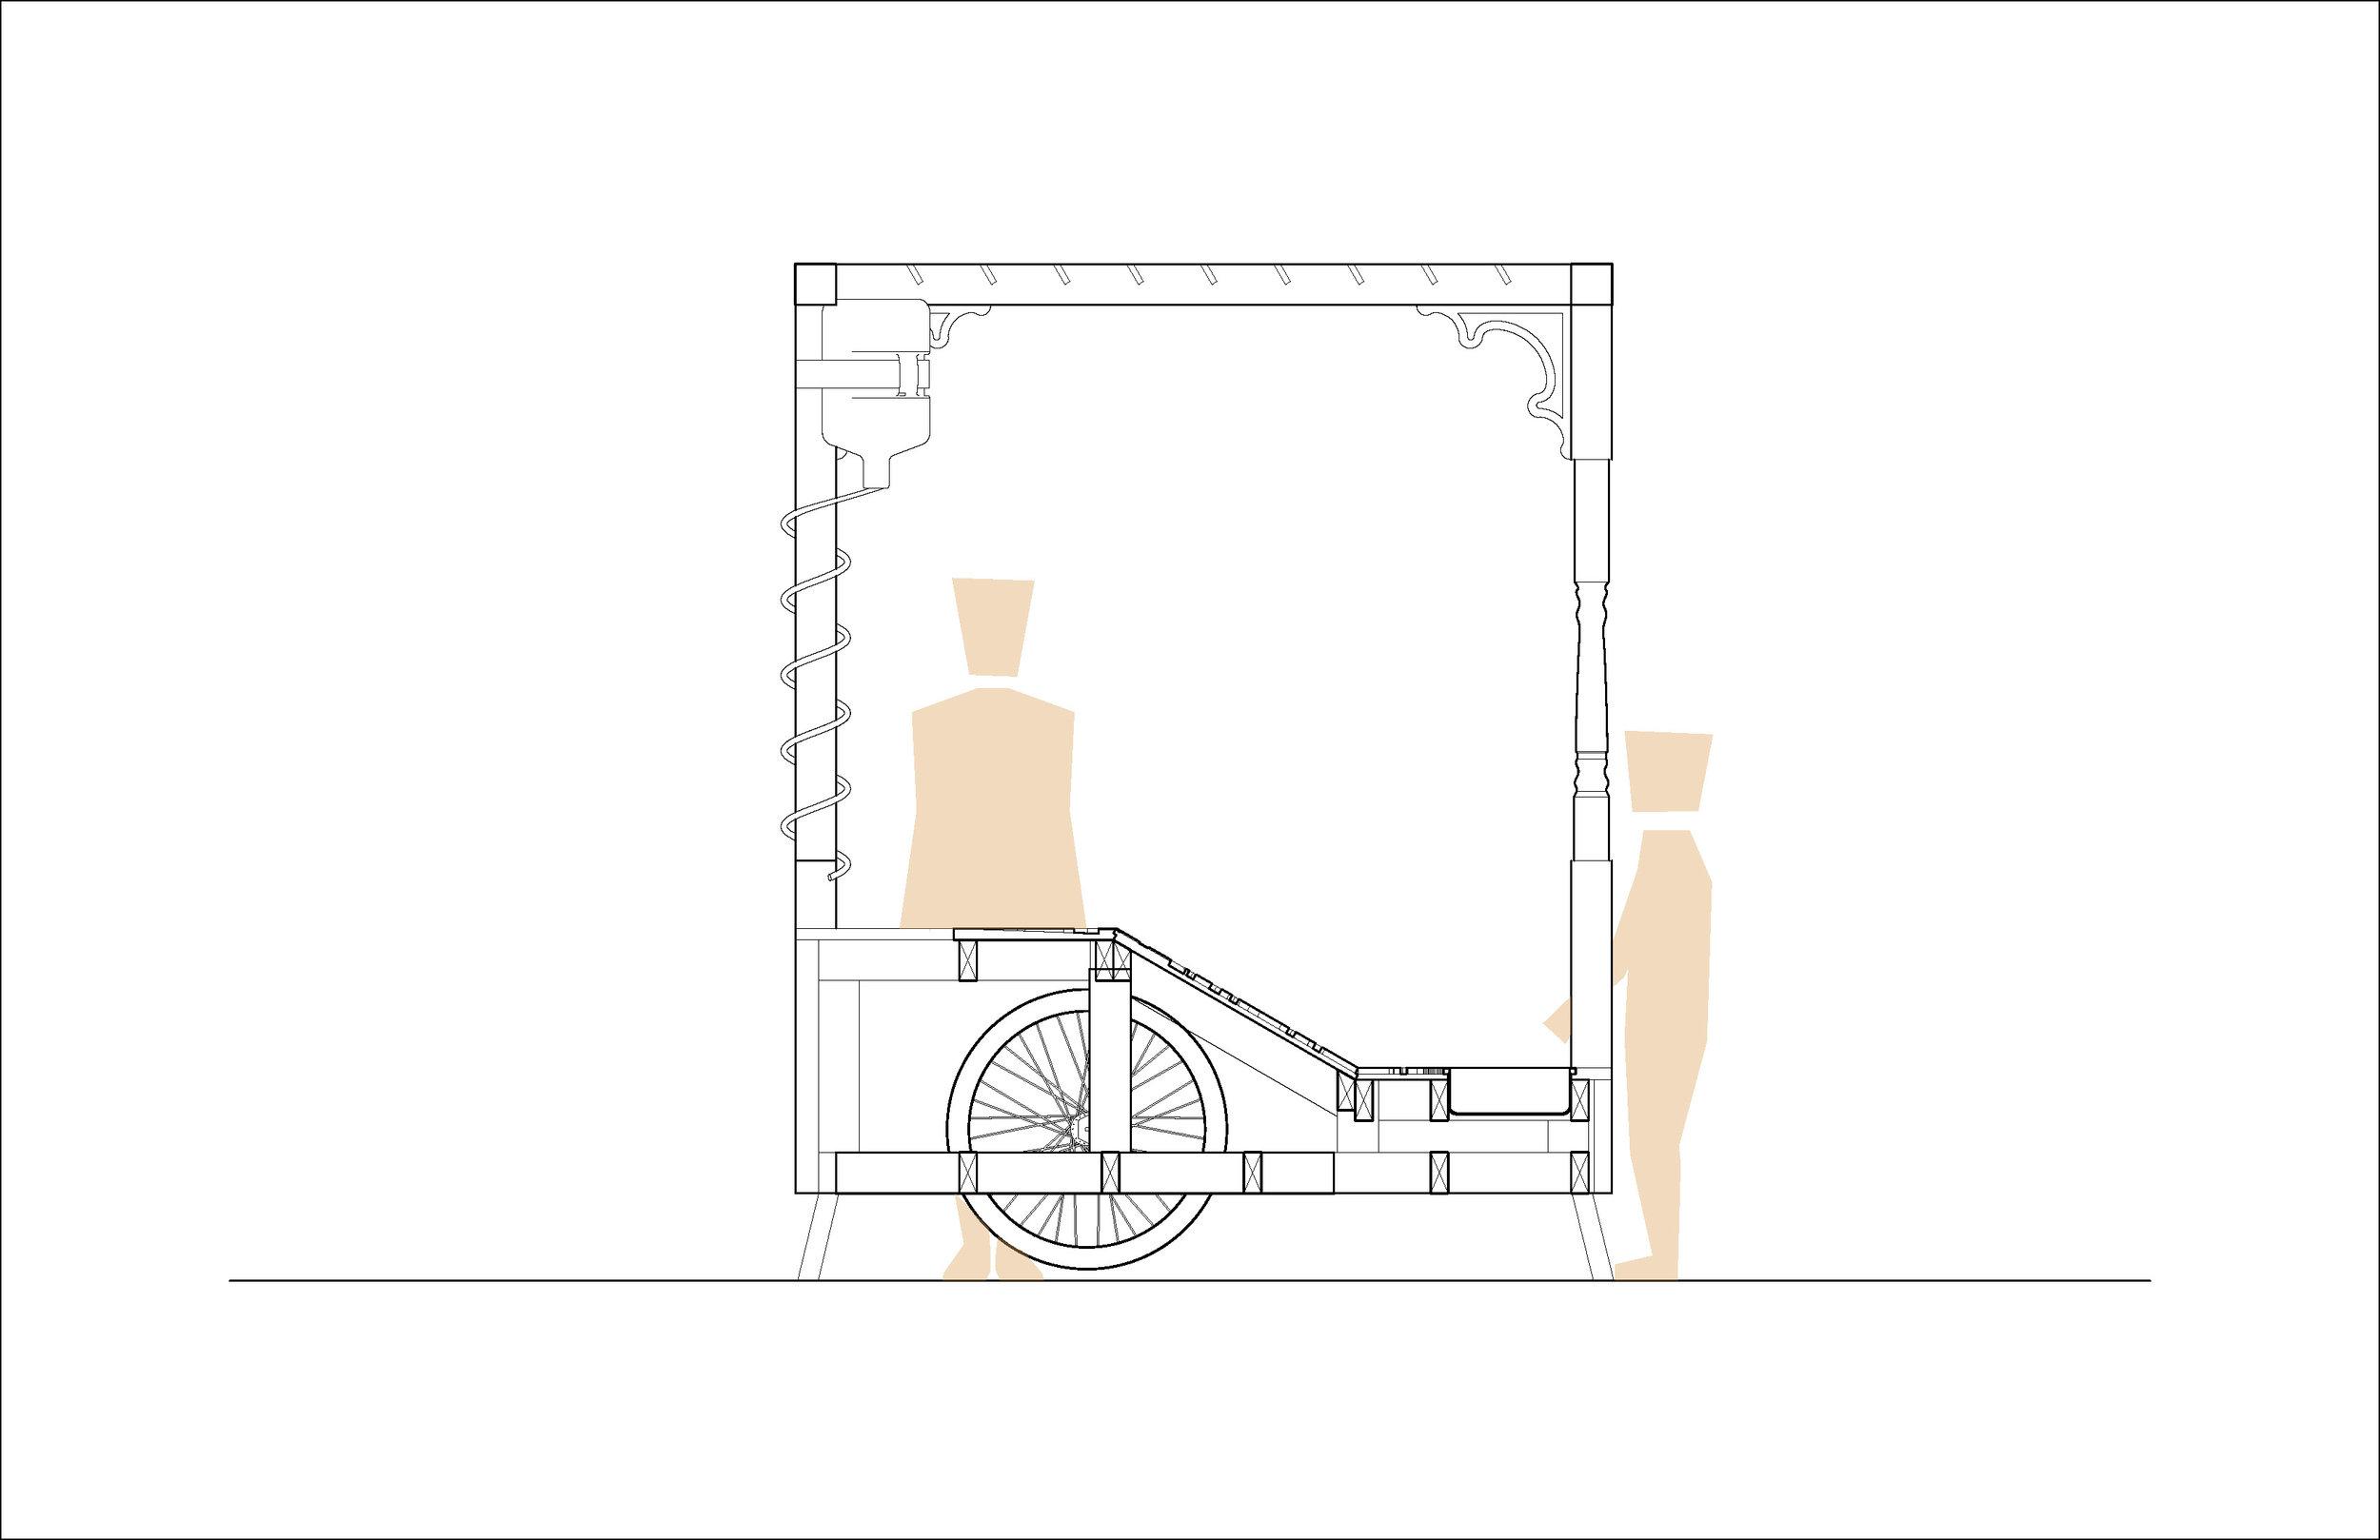 Lab Porch: Elevation